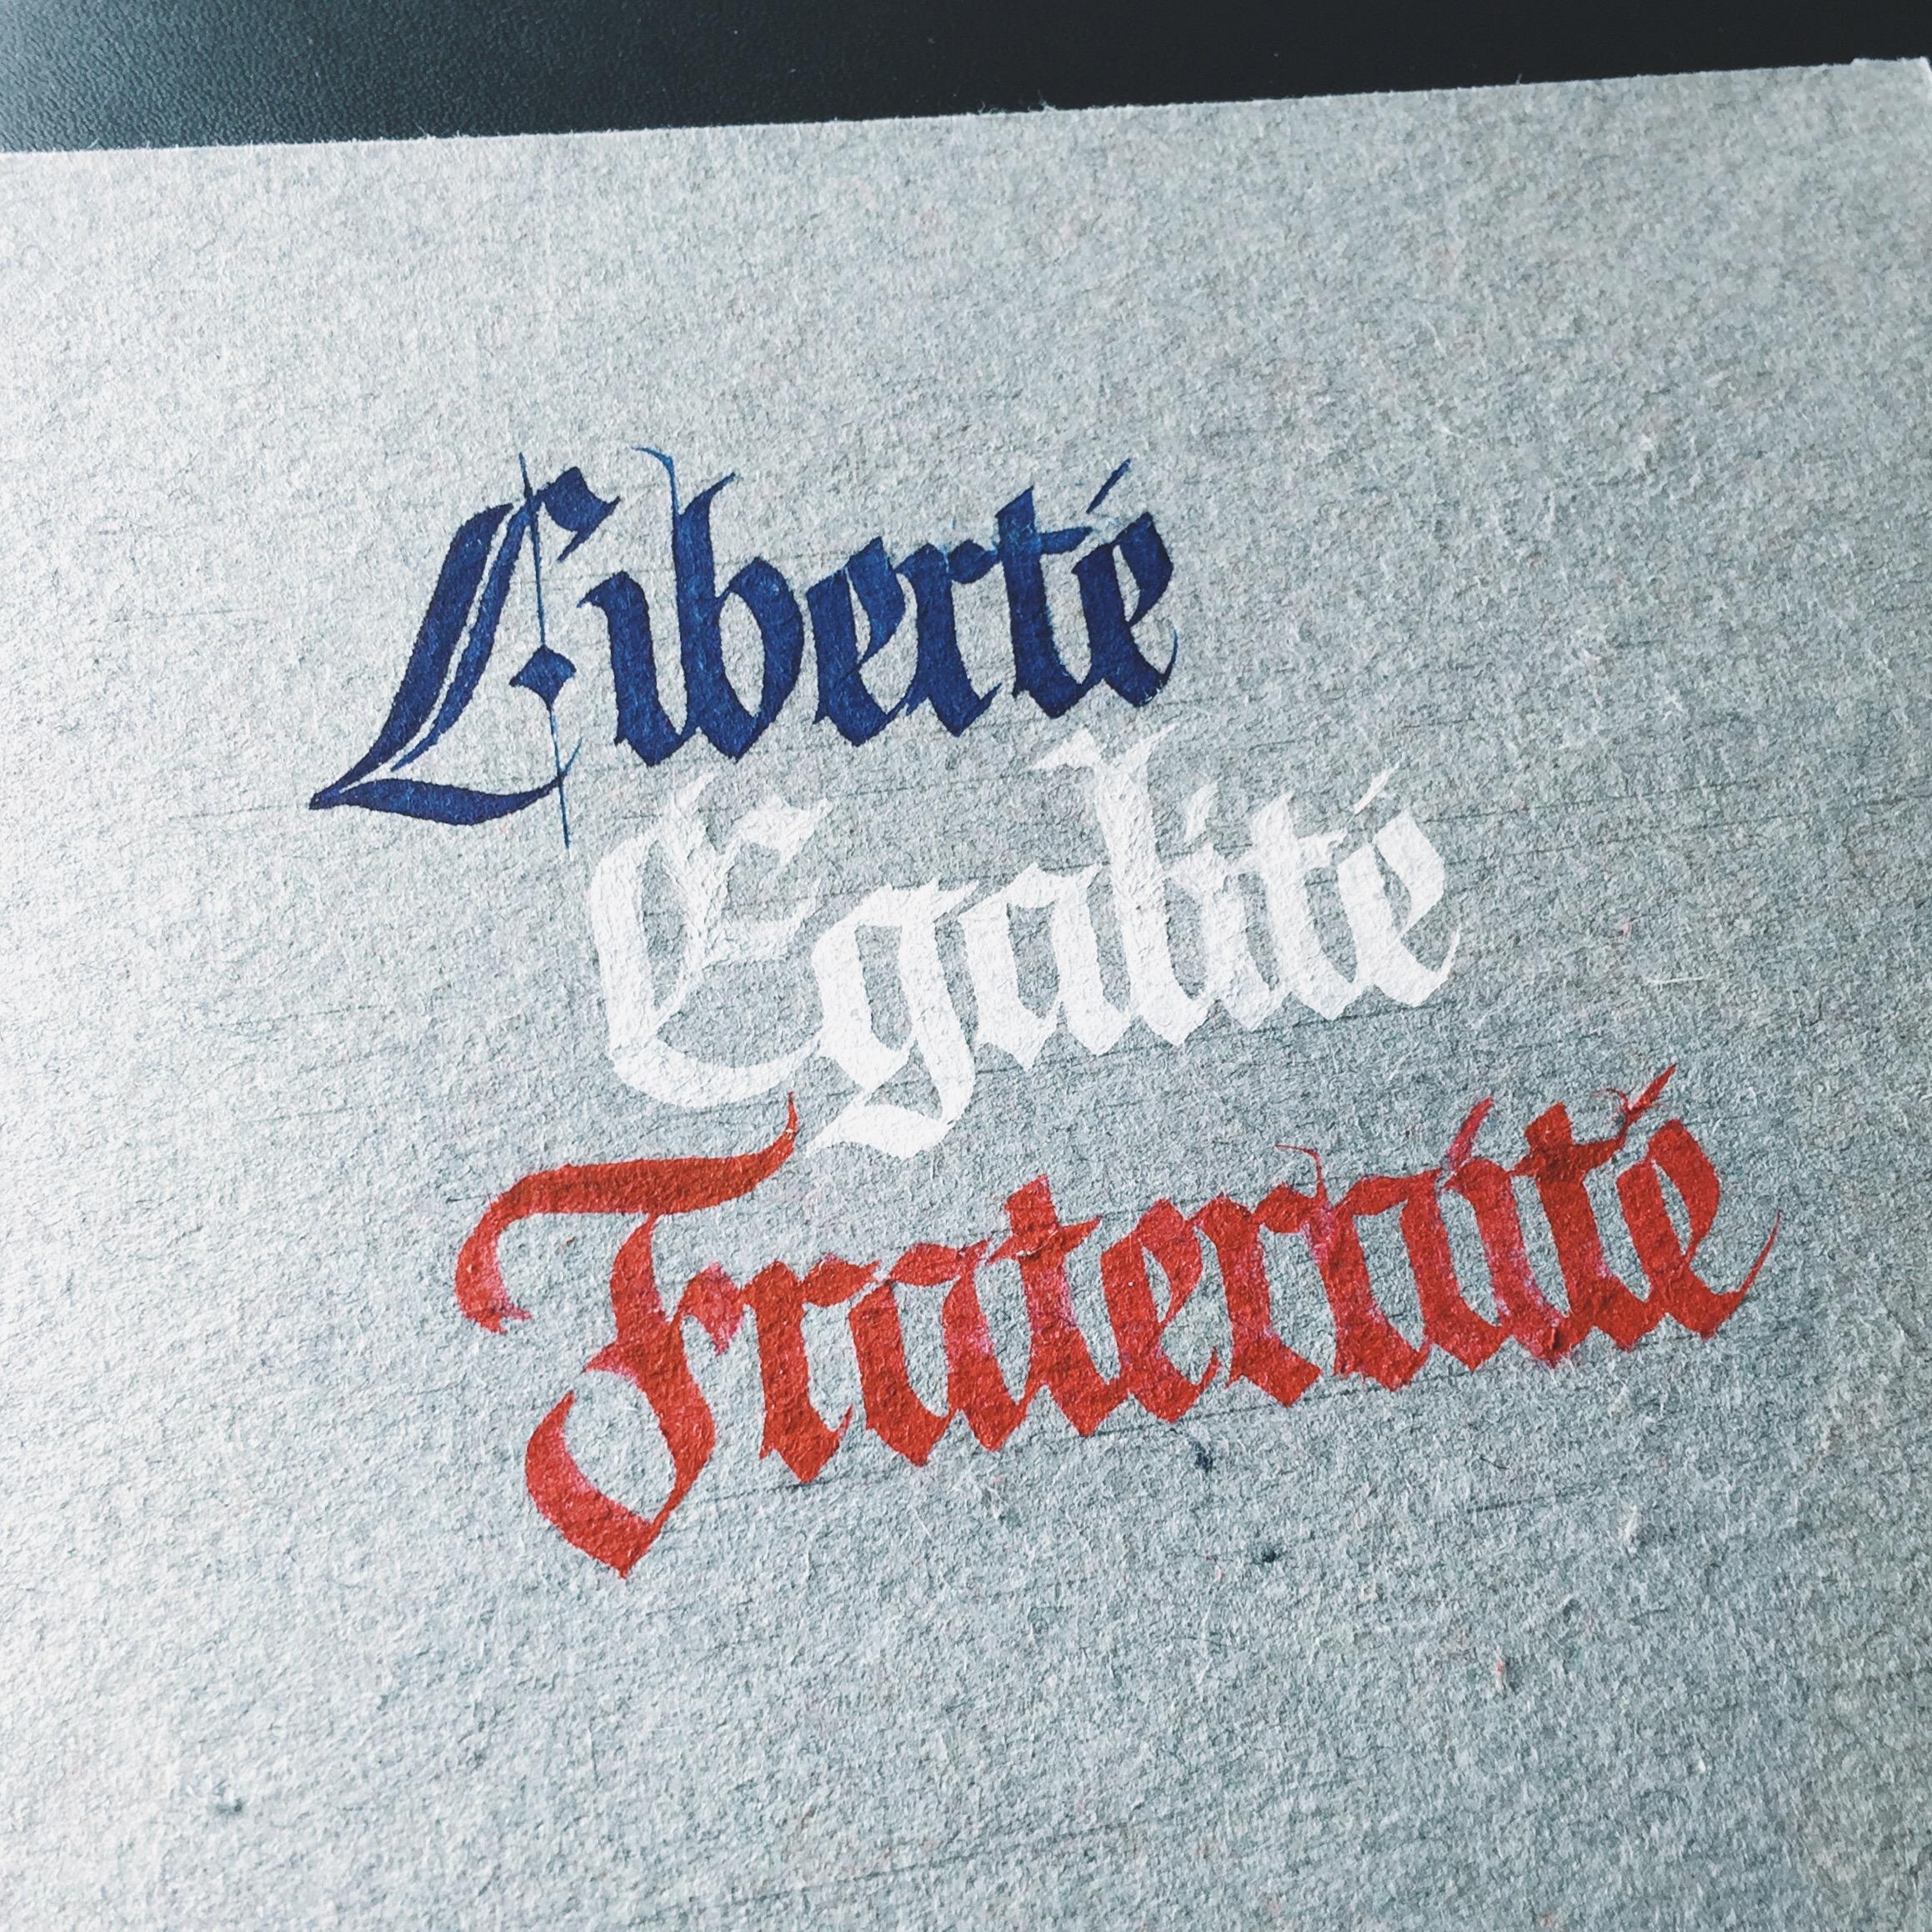 Liberte Egalite Fraternite // blackletter calligraphy by Chavelli www.chavelli.com